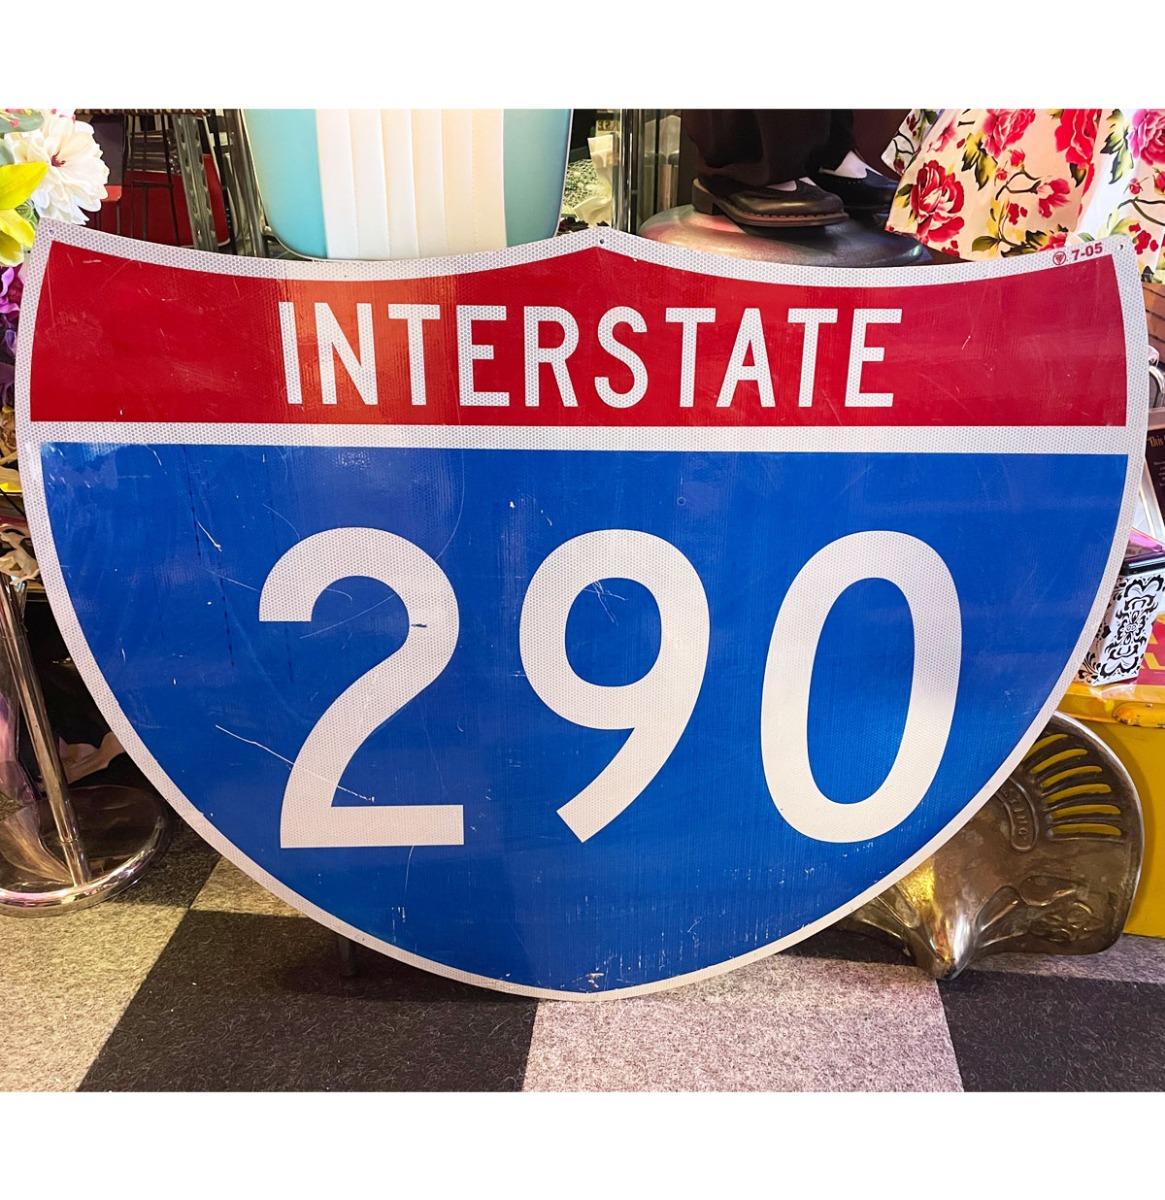 Interstate 290 XL Snelweg Bord 114 x 92 cm